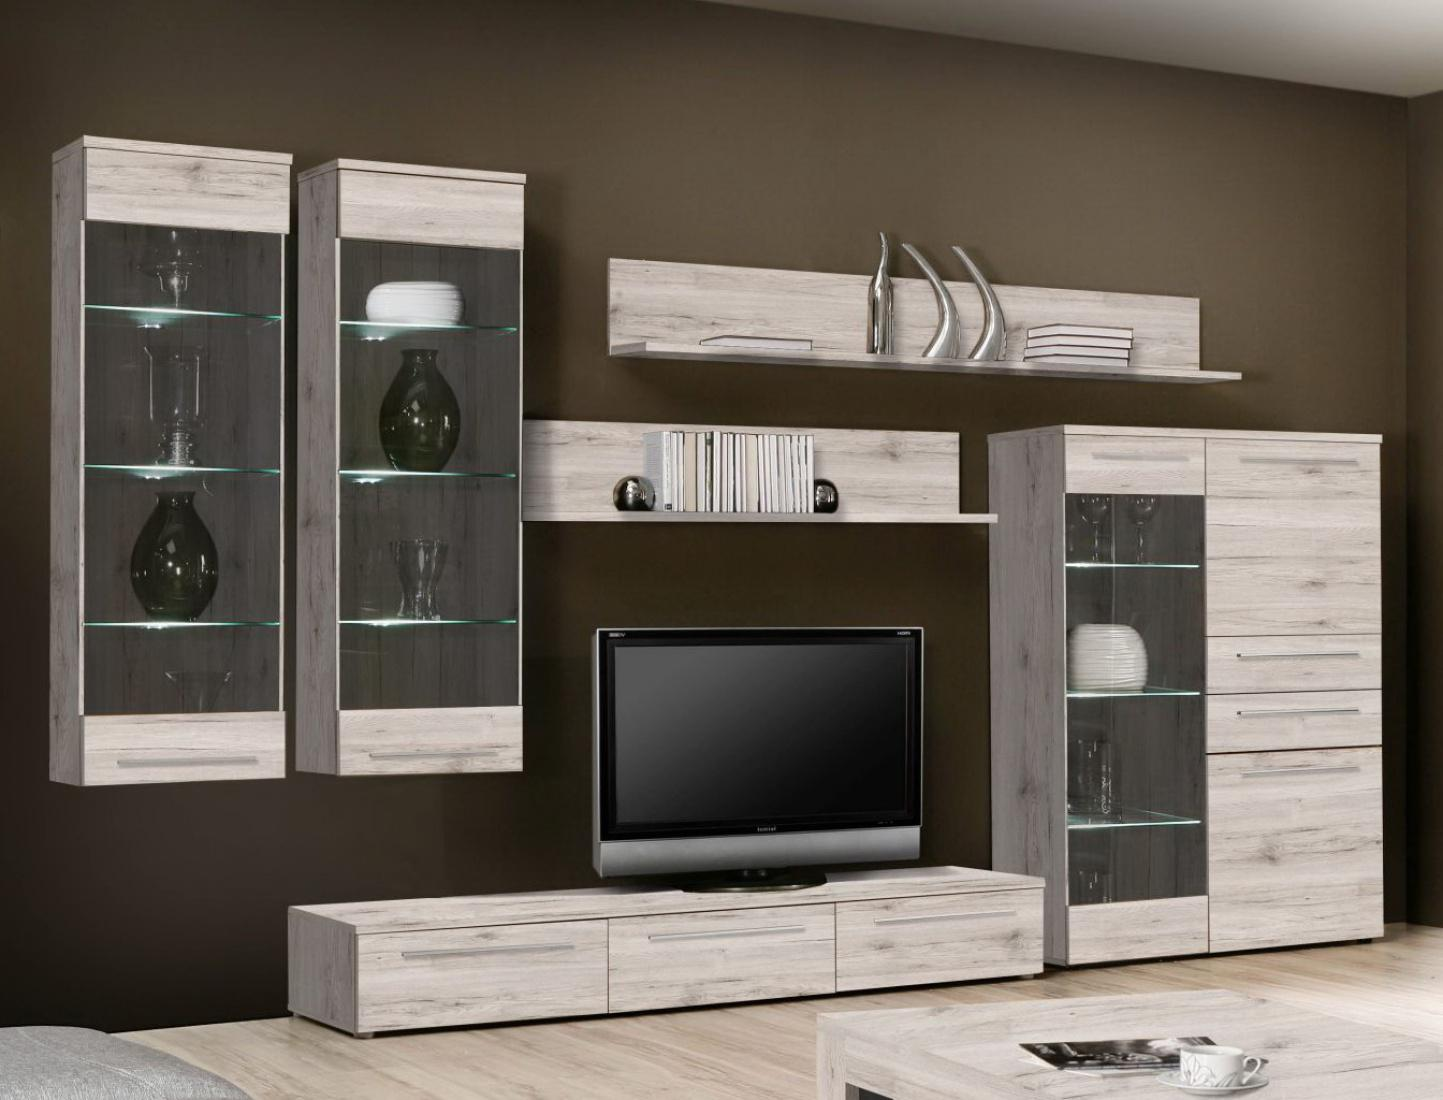 wohnwand mit beleuchtung emily 6 teilig in sandeiche. Black Bedroom Furniture Sets. Home Design Ideas